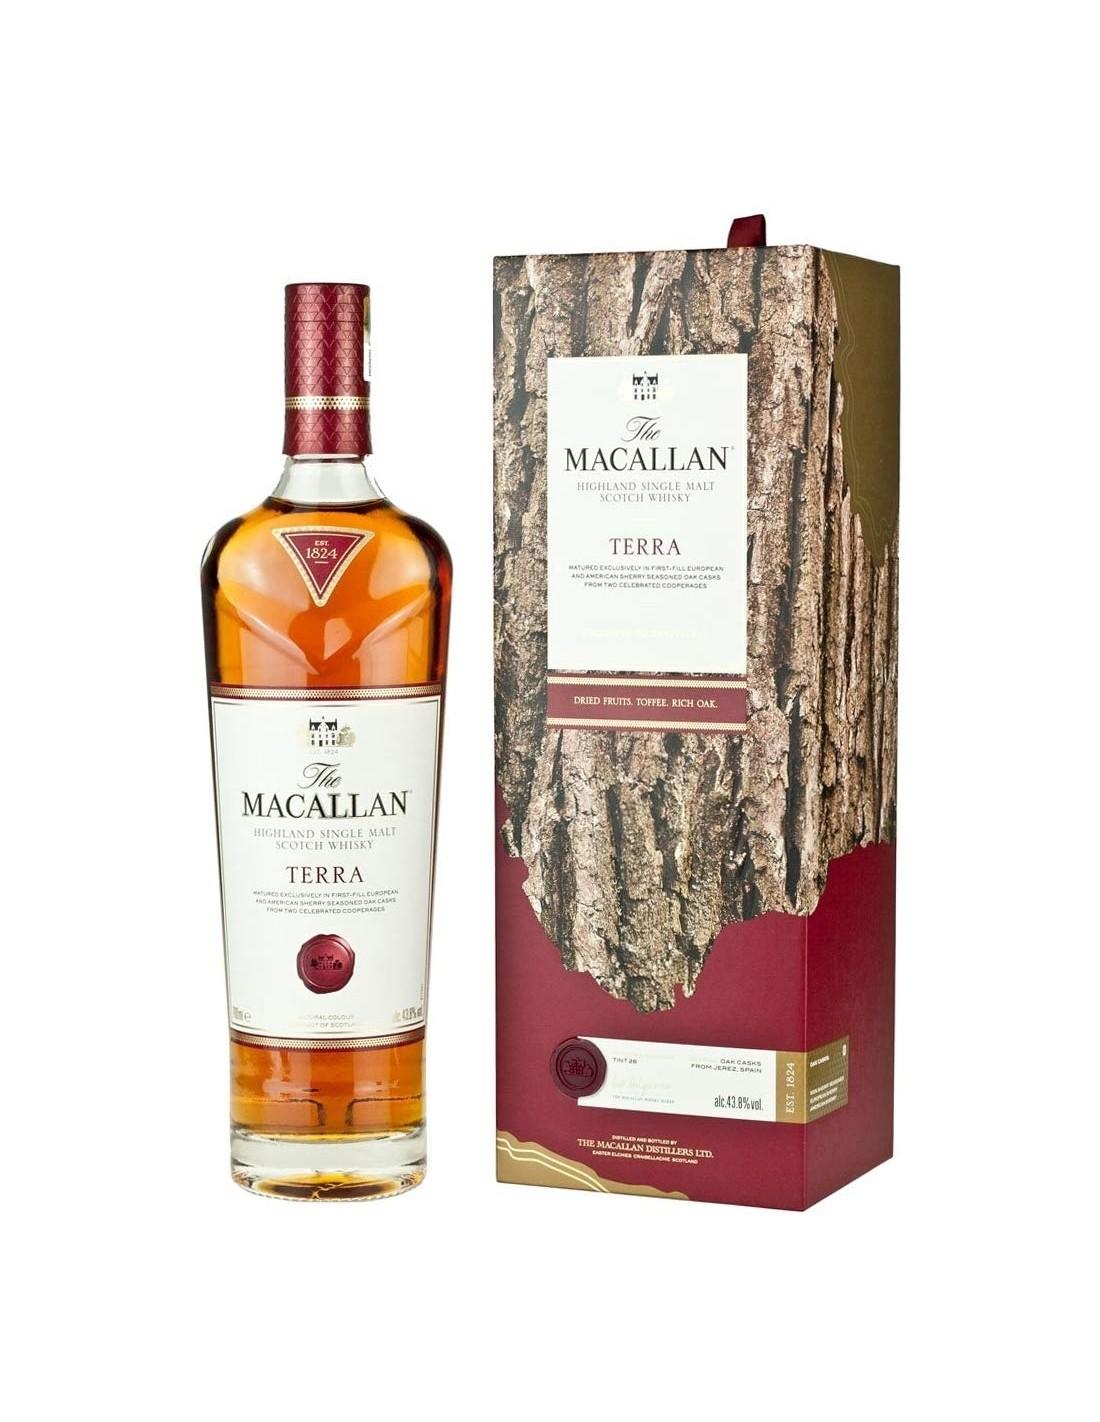 Whisky Macallan Terra, 43.8% alc., 0.7L, Scotia